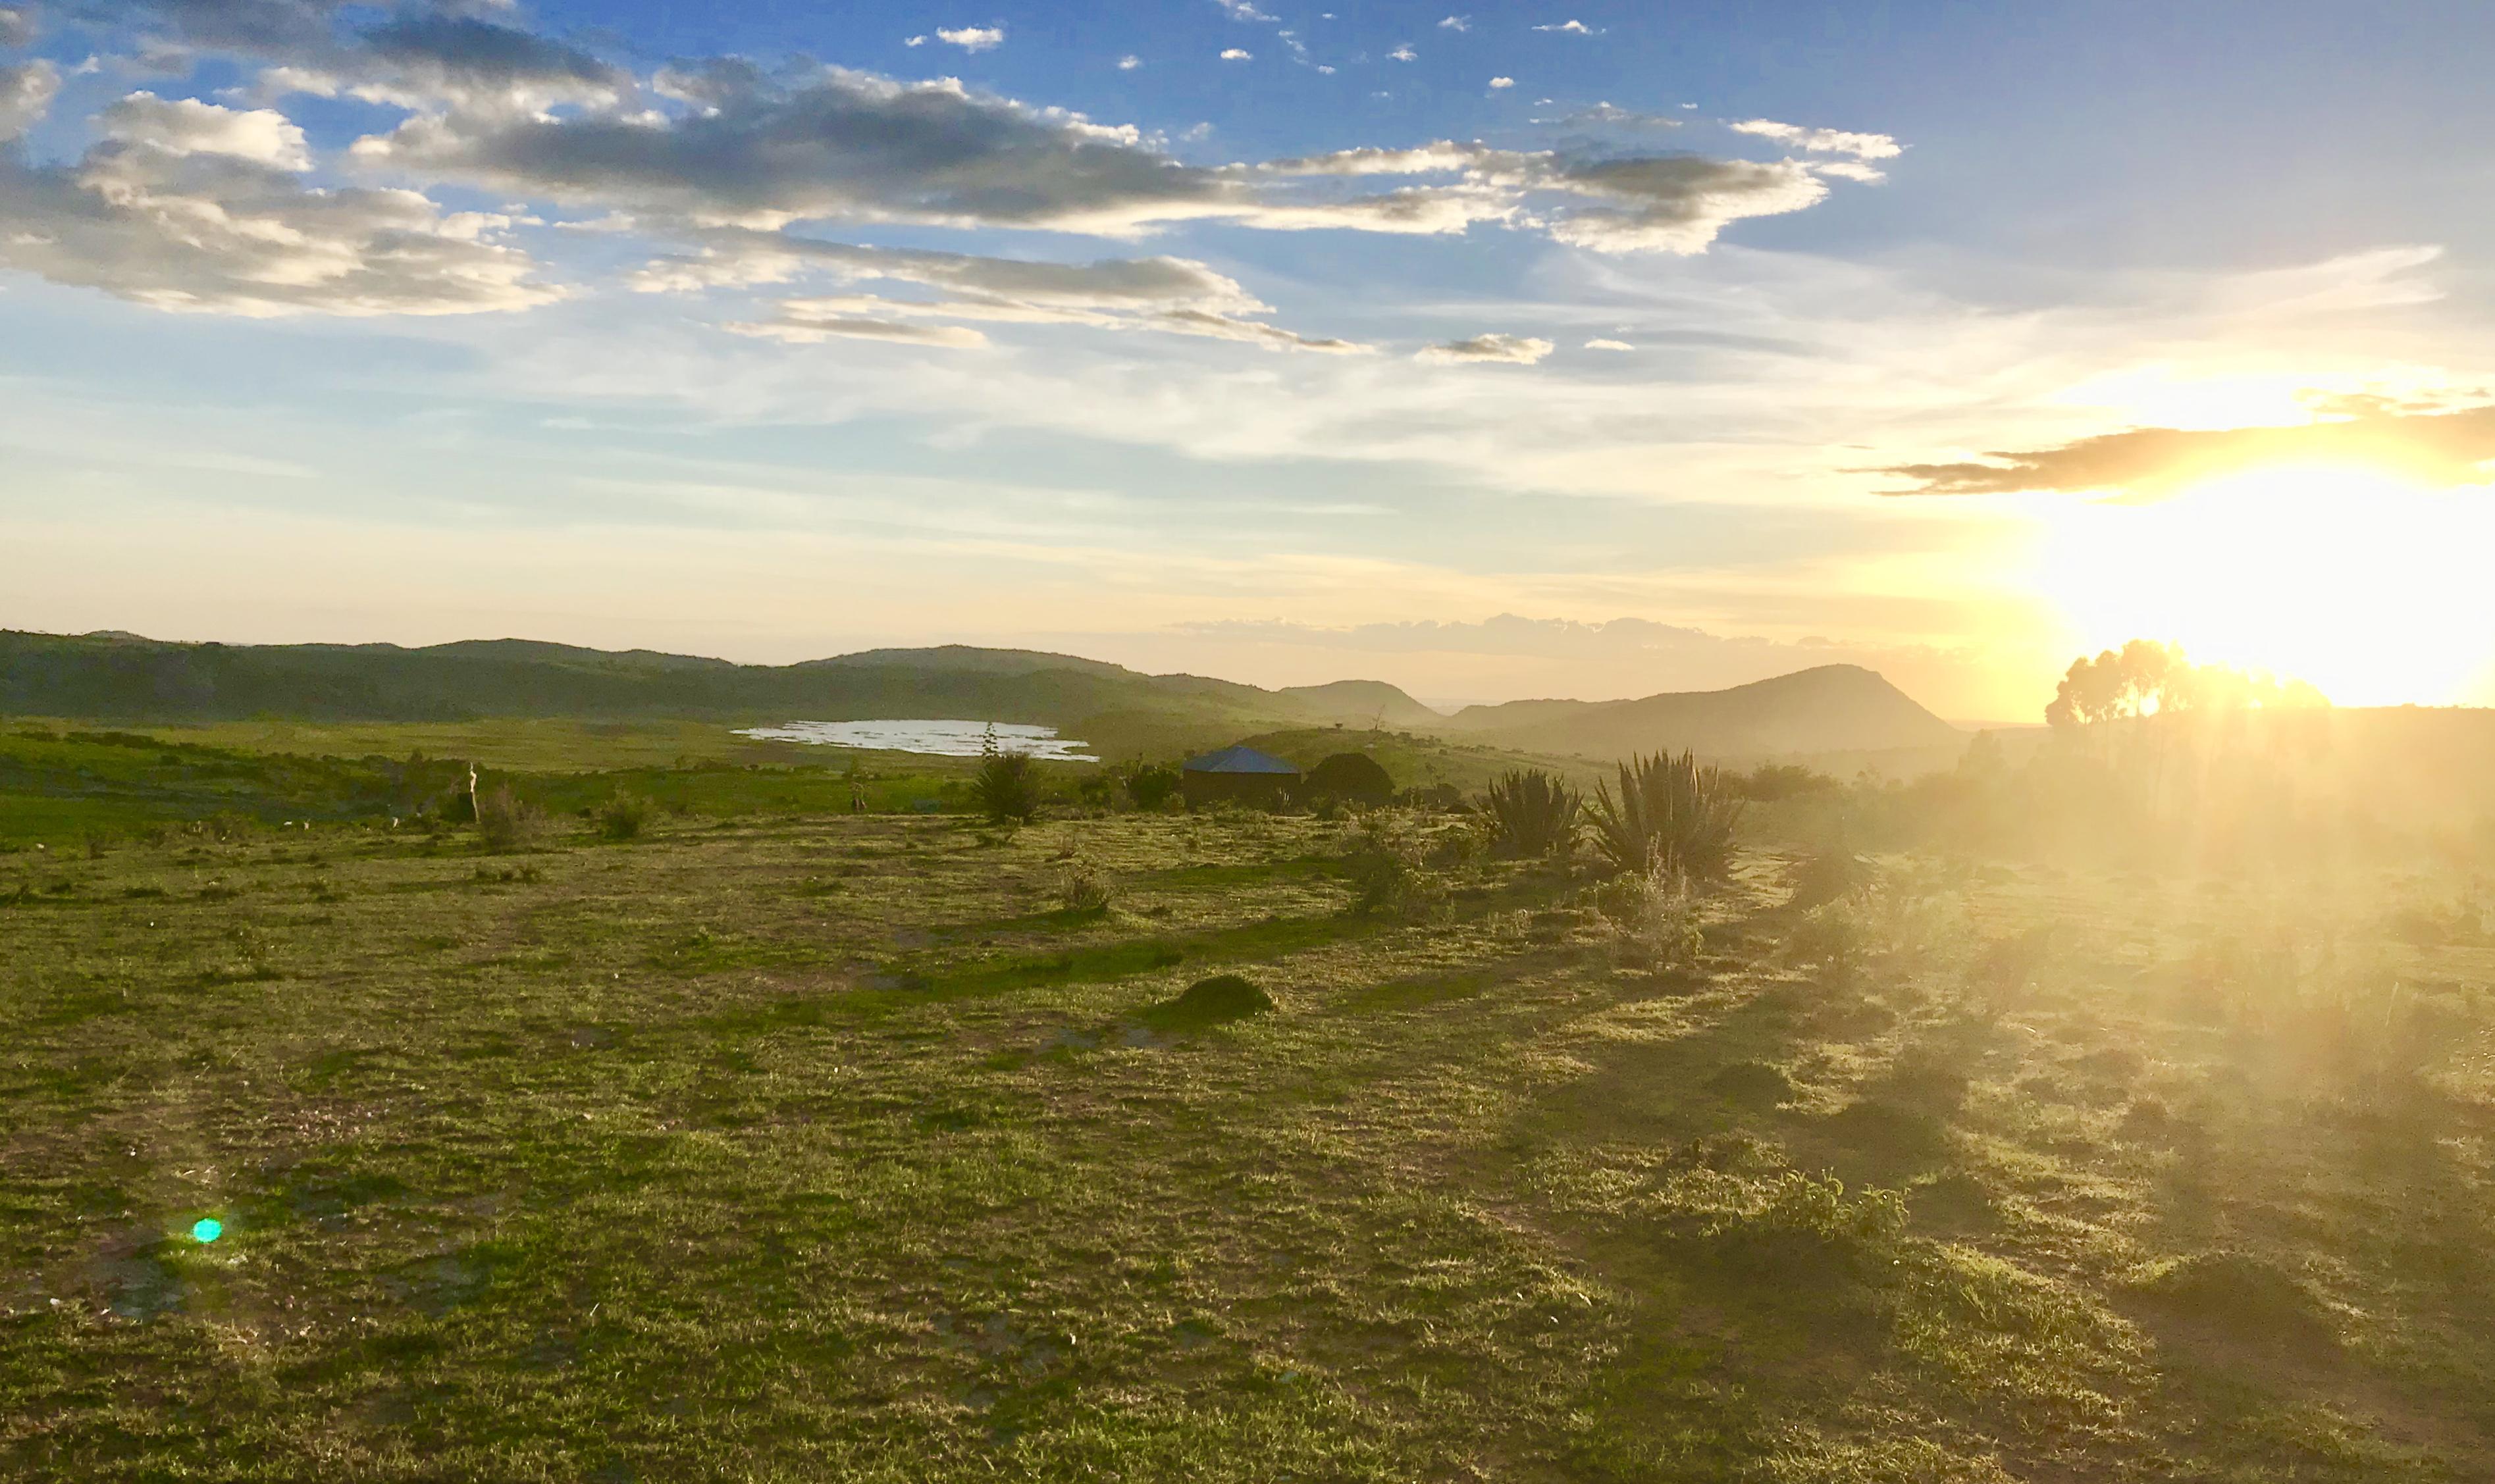 Sun Set, Mbulu, Tanzania, Africa, Camping, Explore